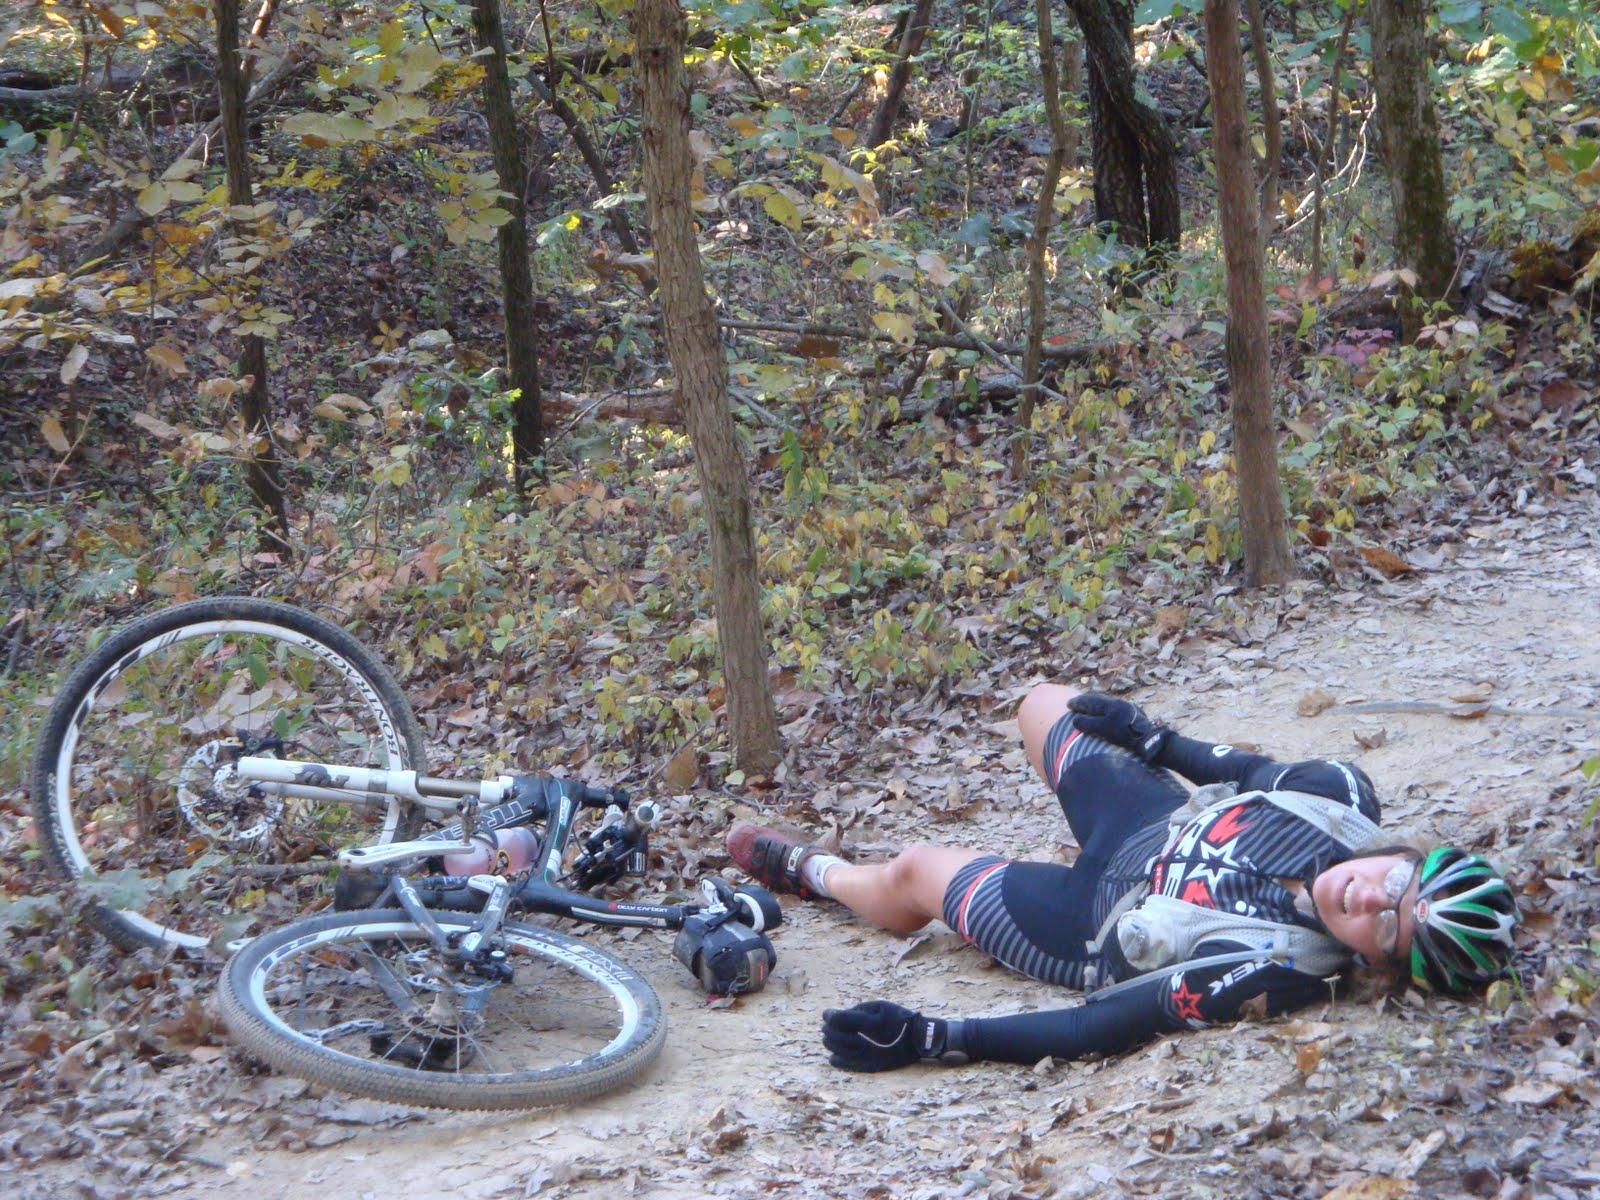 I Broke My Bike